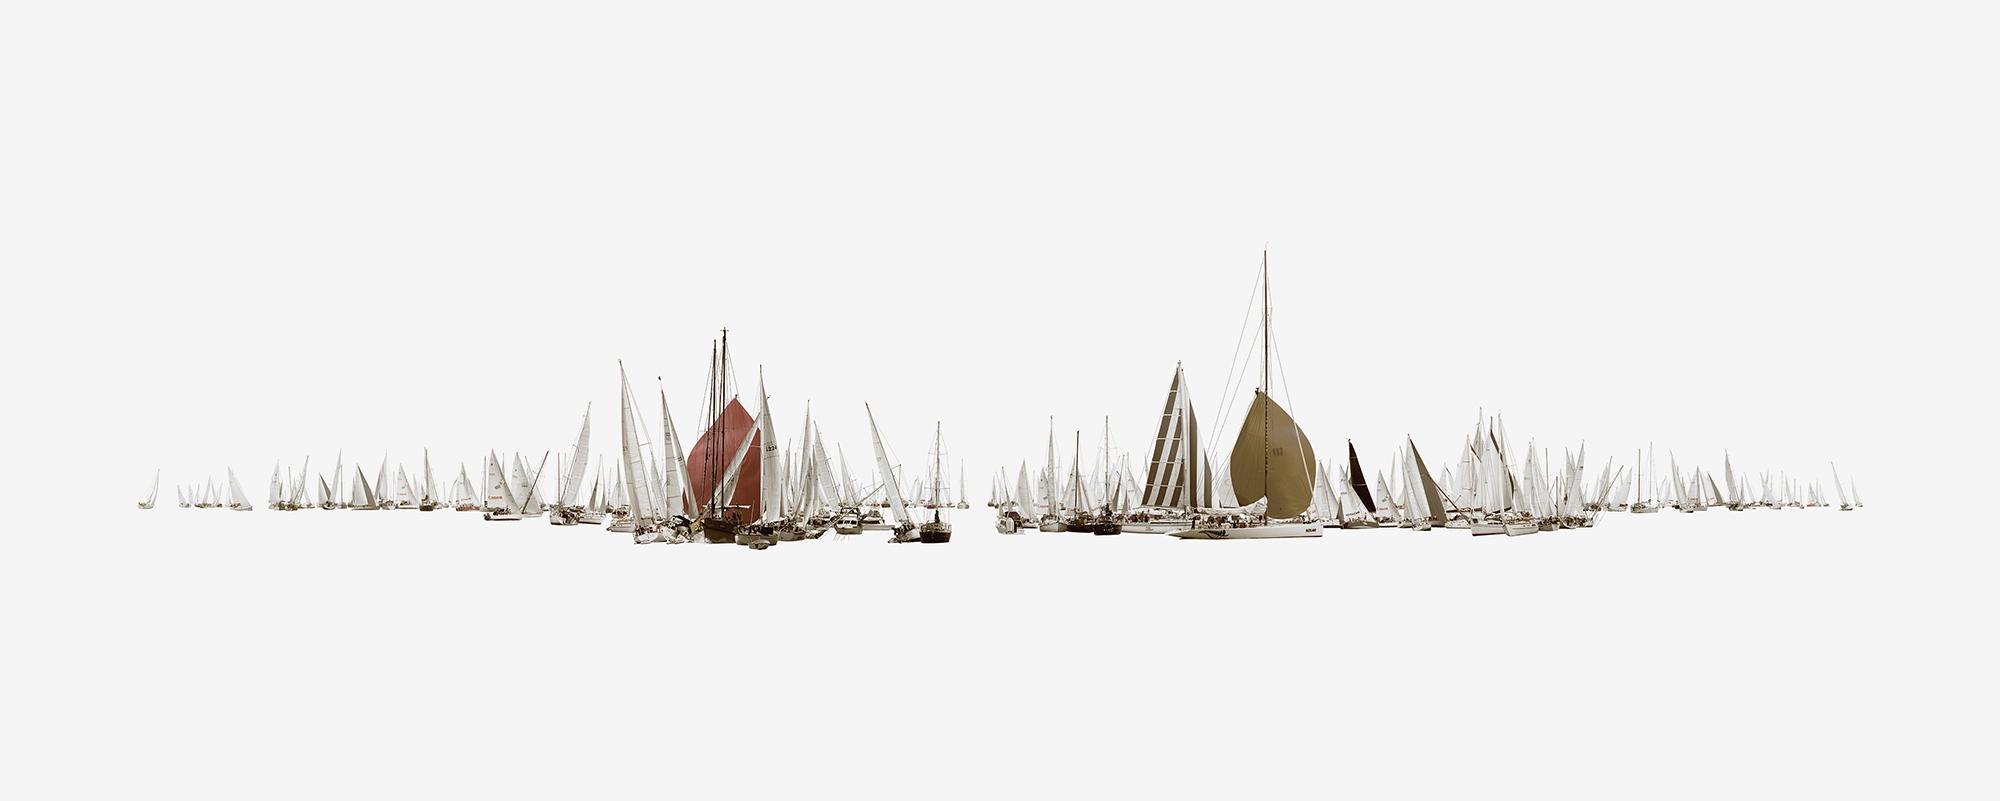 City of sails I